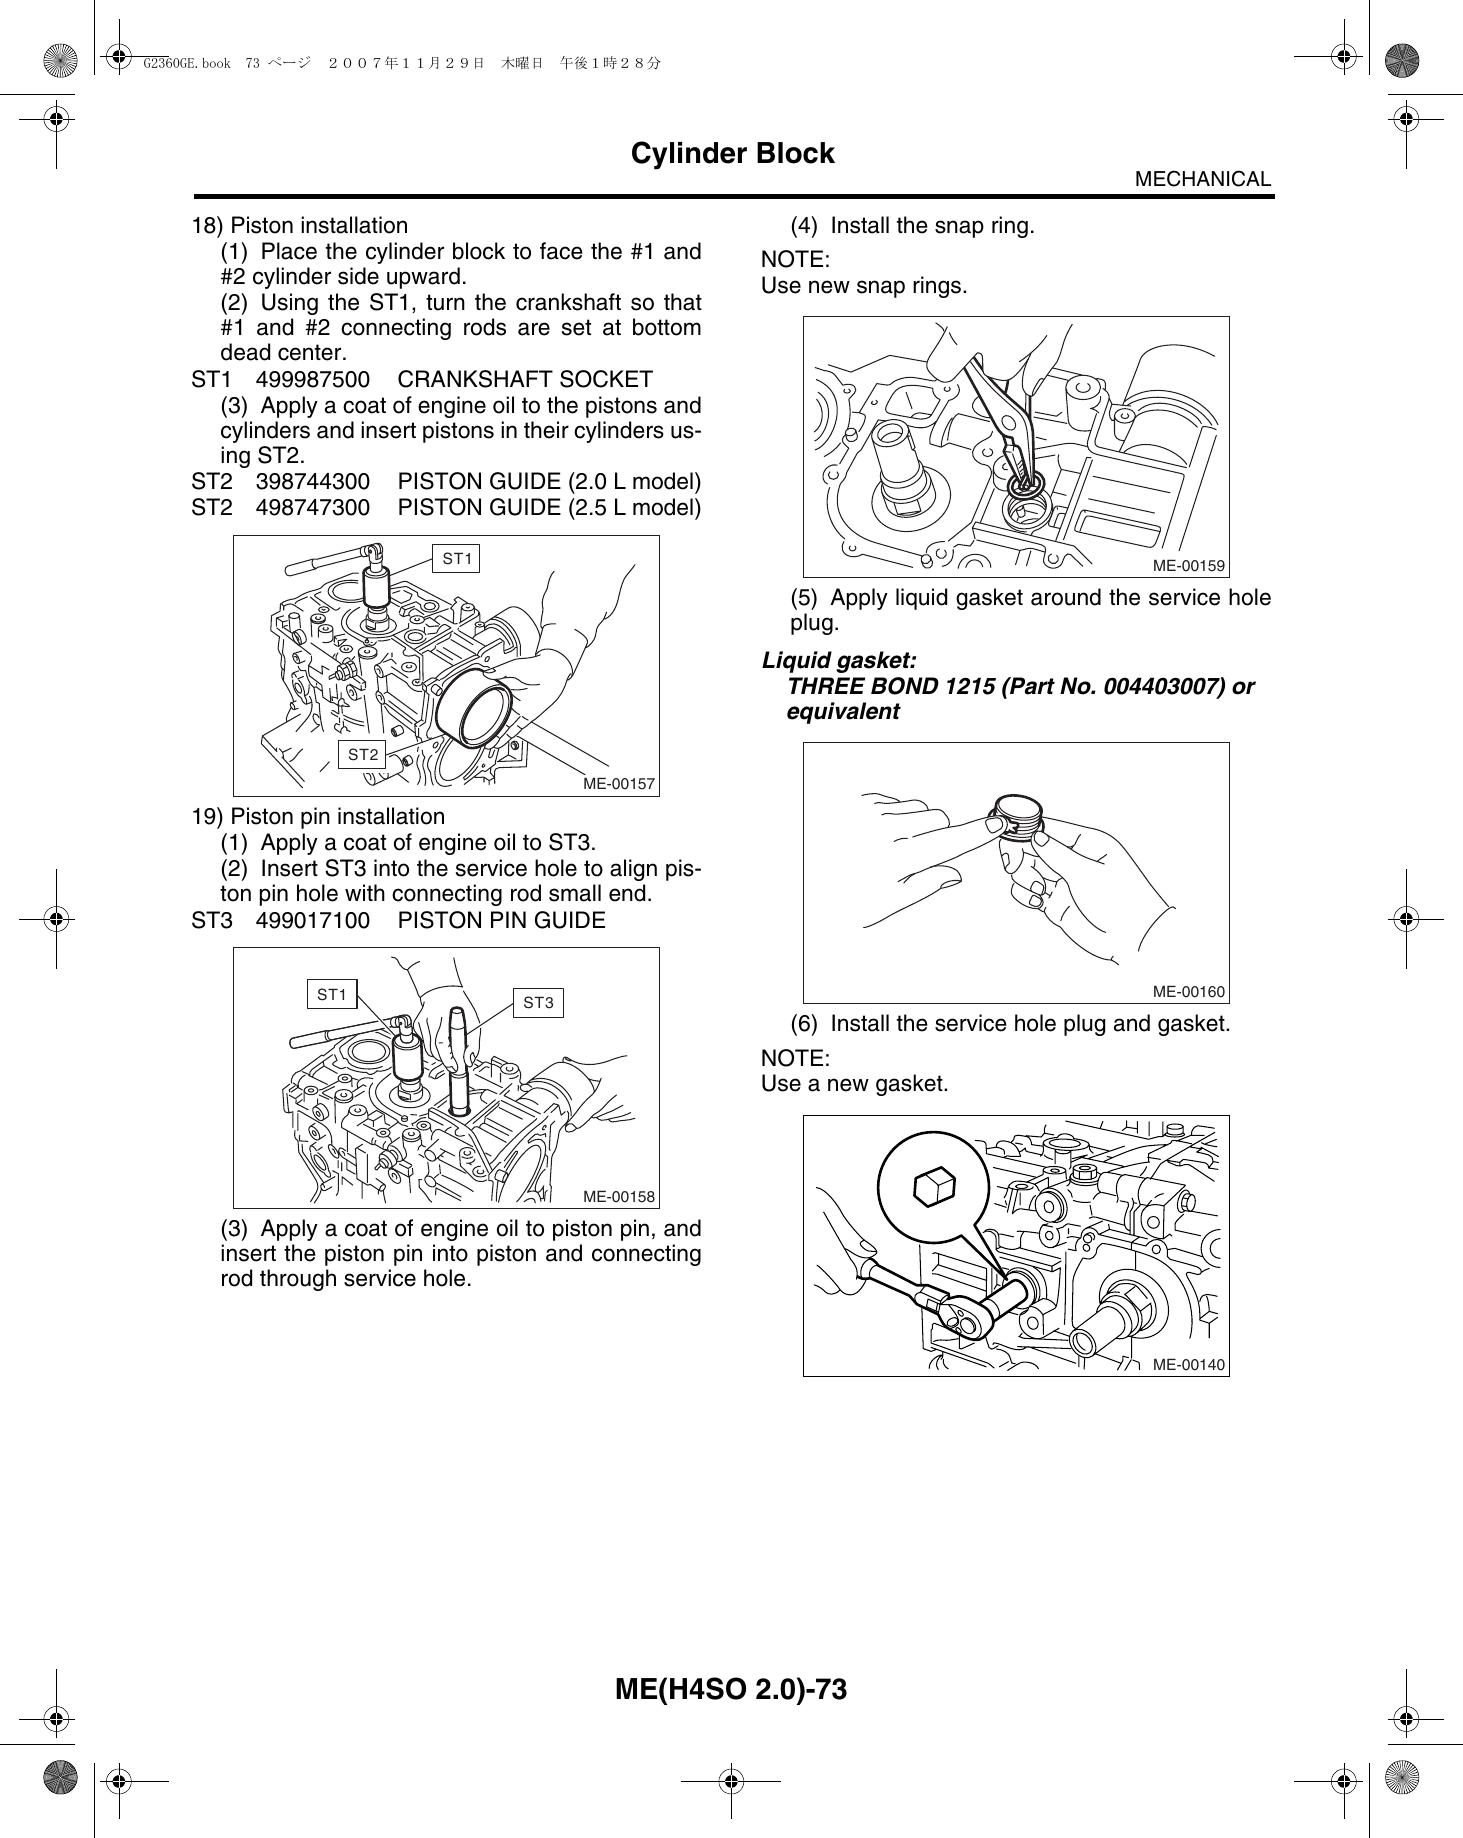 hight resolution of subaru2005subarulegacy819117 99225156 user guide page 299 png